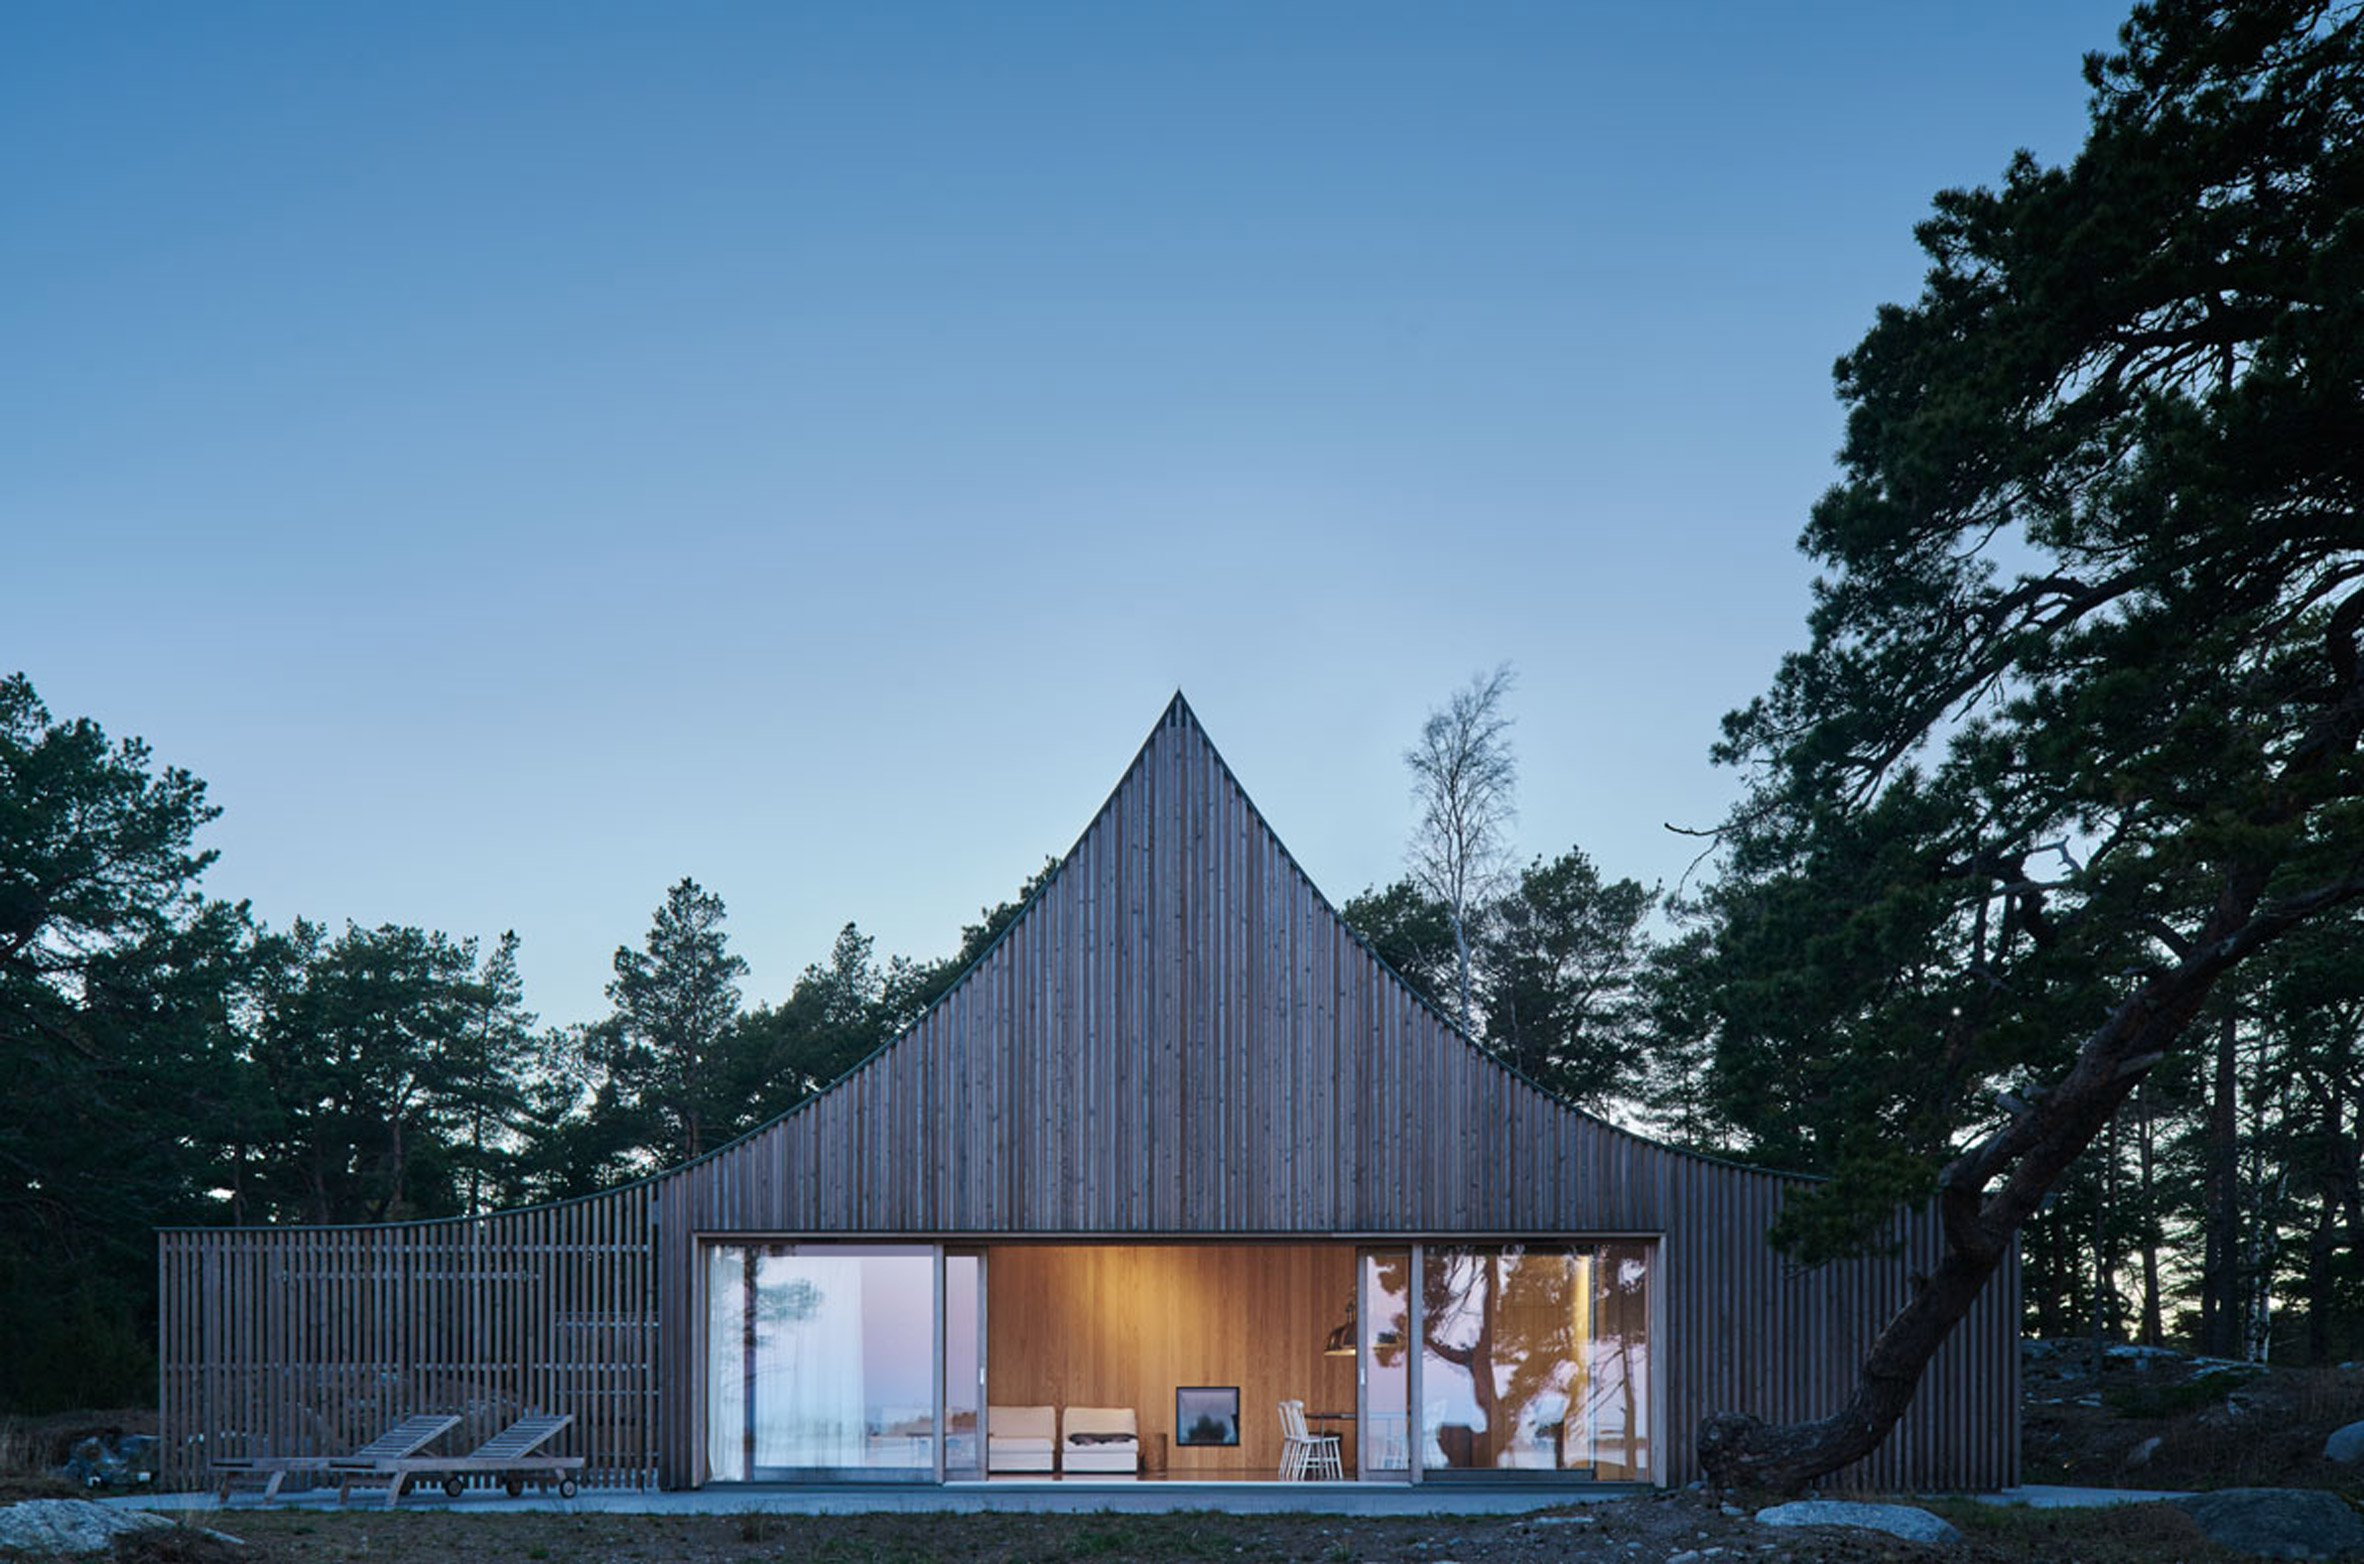 krokholmen-house-tham-videgard-architecture_dezeen_2364_col_11.jpg